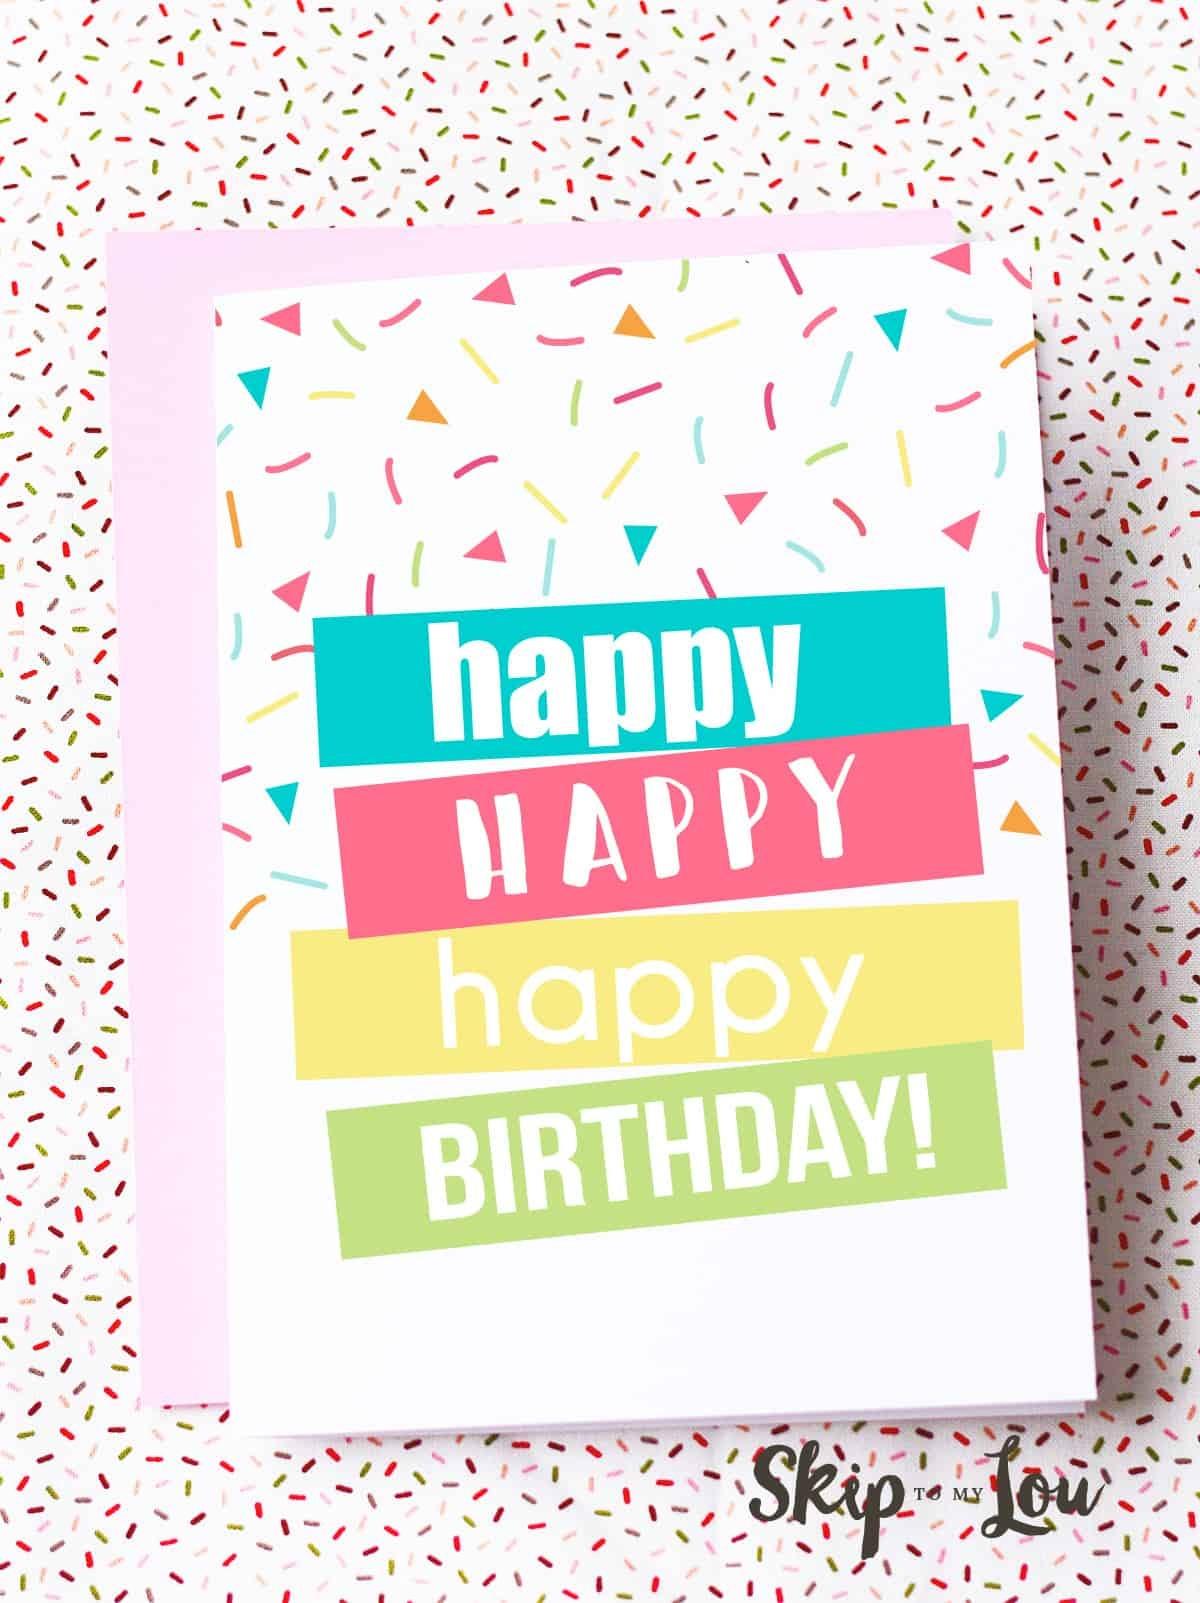 Free Printable Birthday Cards | Skip To My Lou - Free Printable Birthday Cards